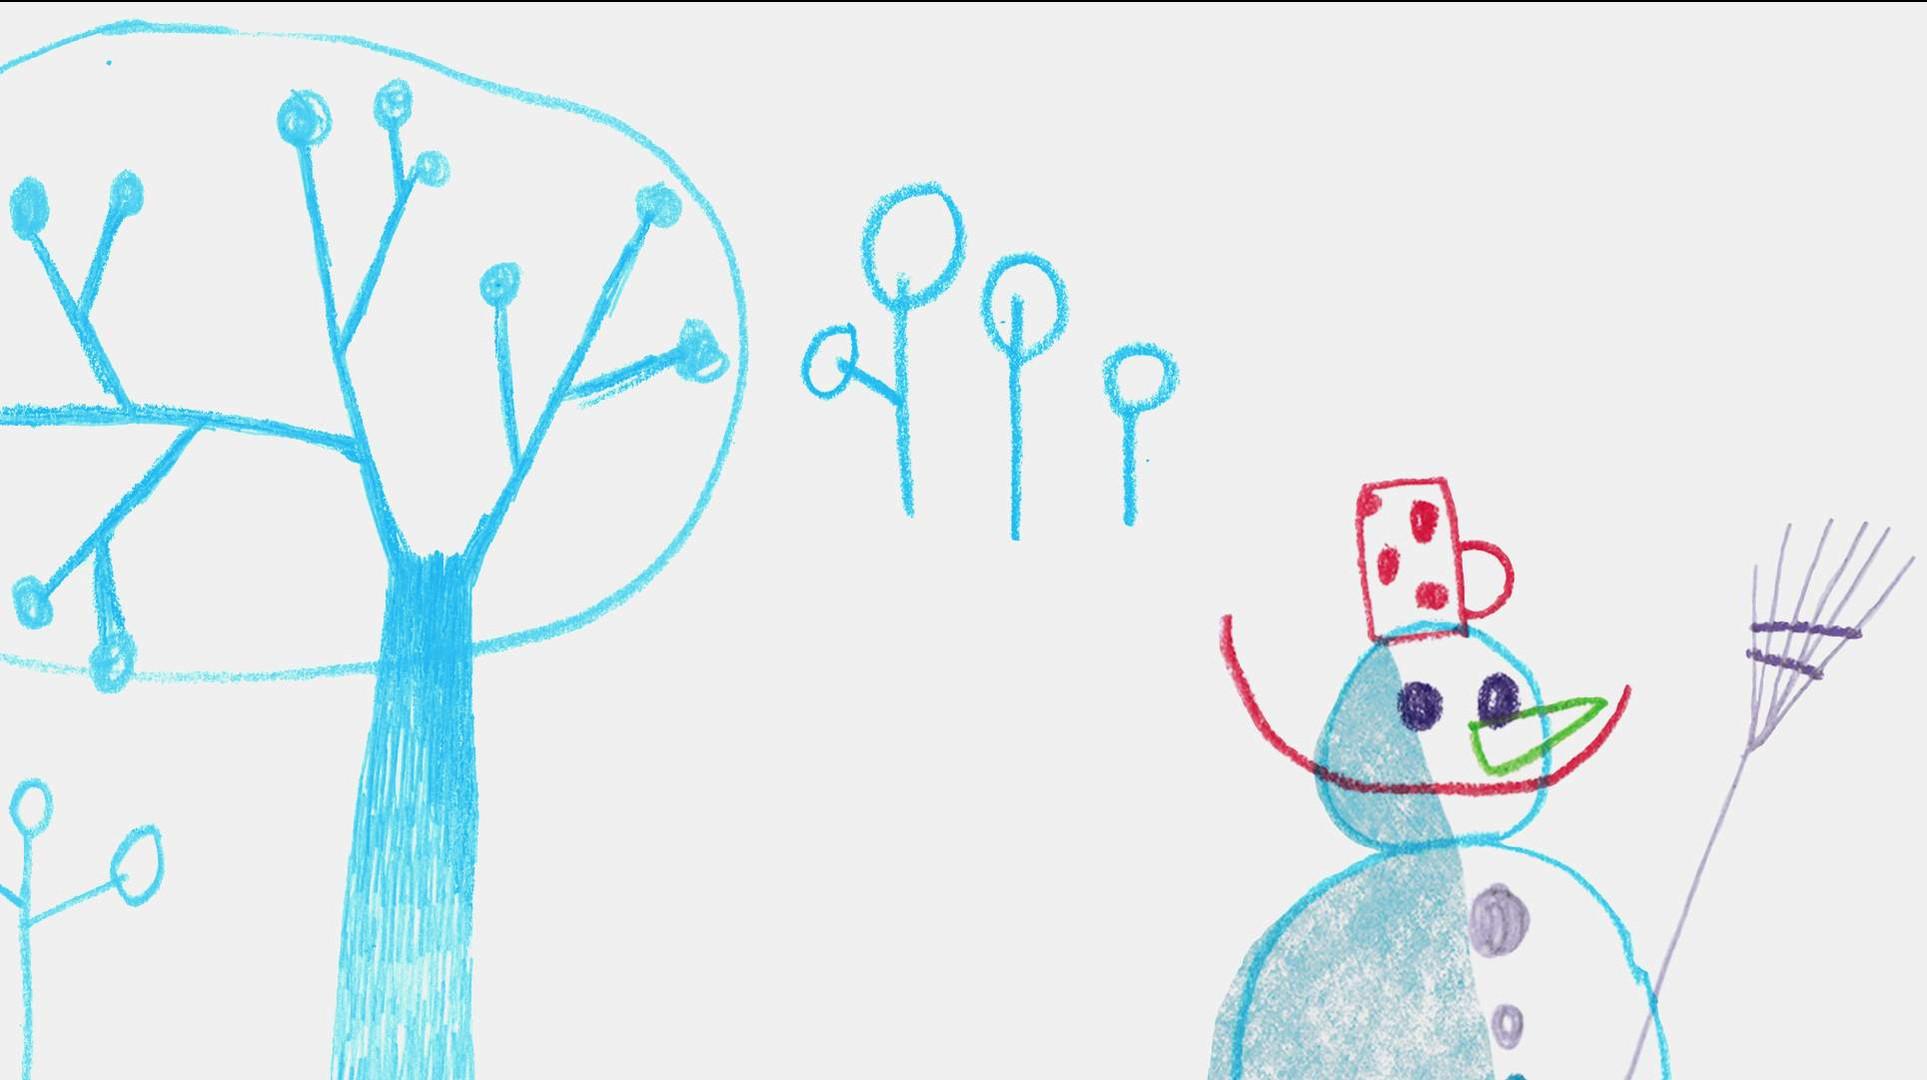 Let's_Play_ilustration_winter2.jpg